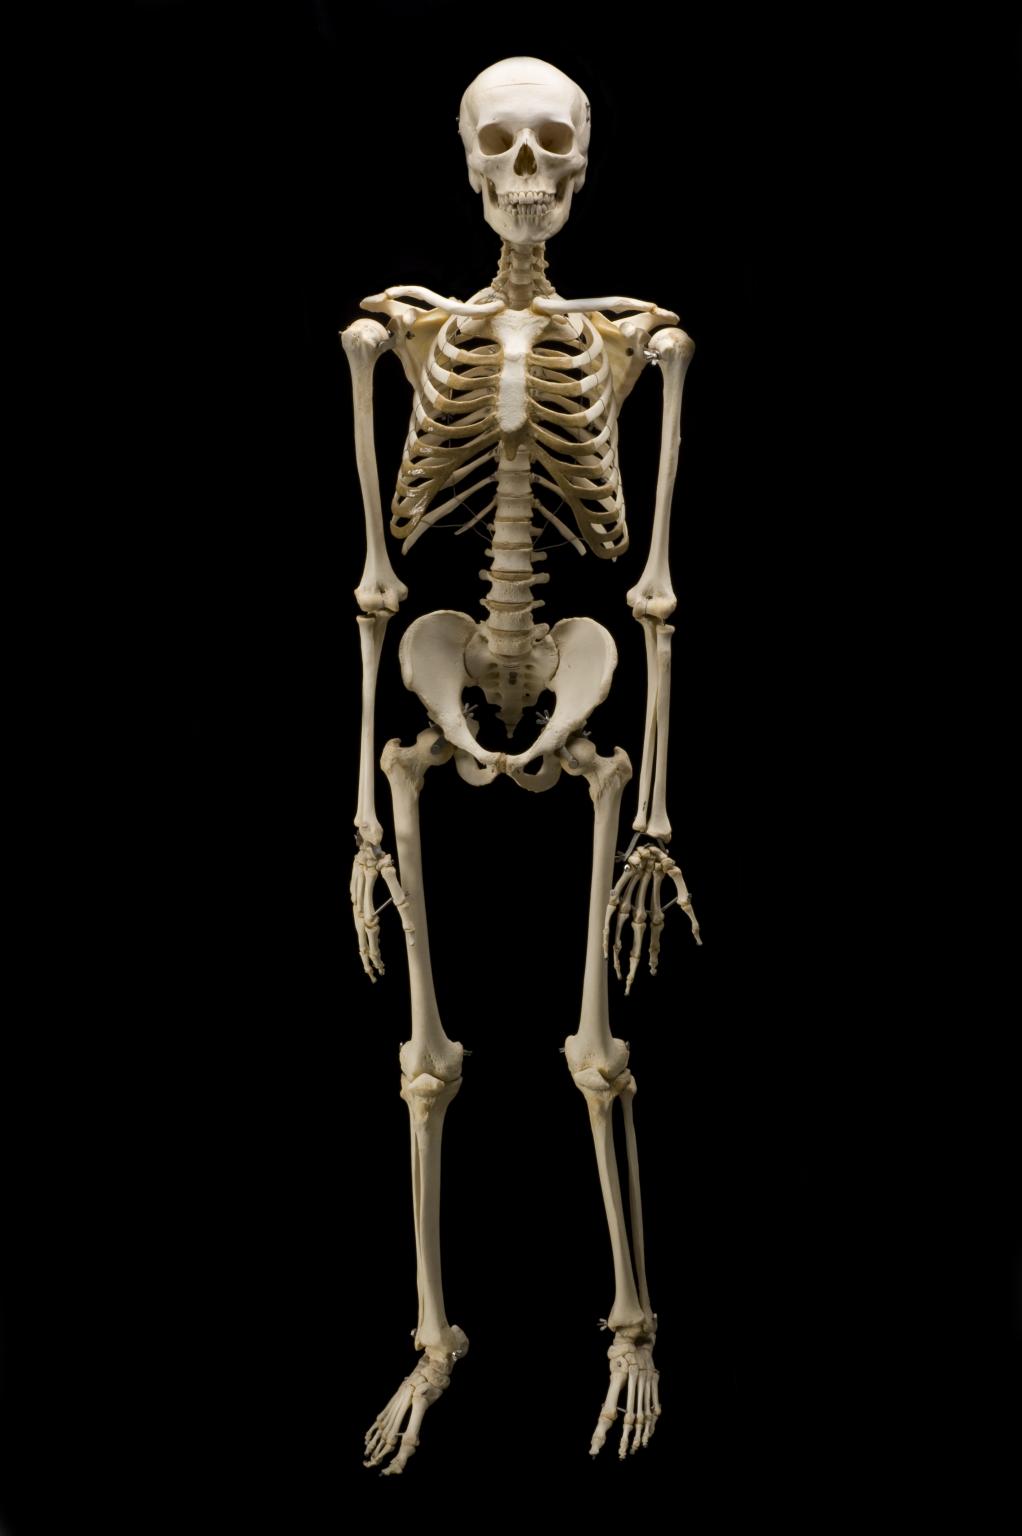 real skeleton - Google Search | Tattoo ideas | Pinterest ...